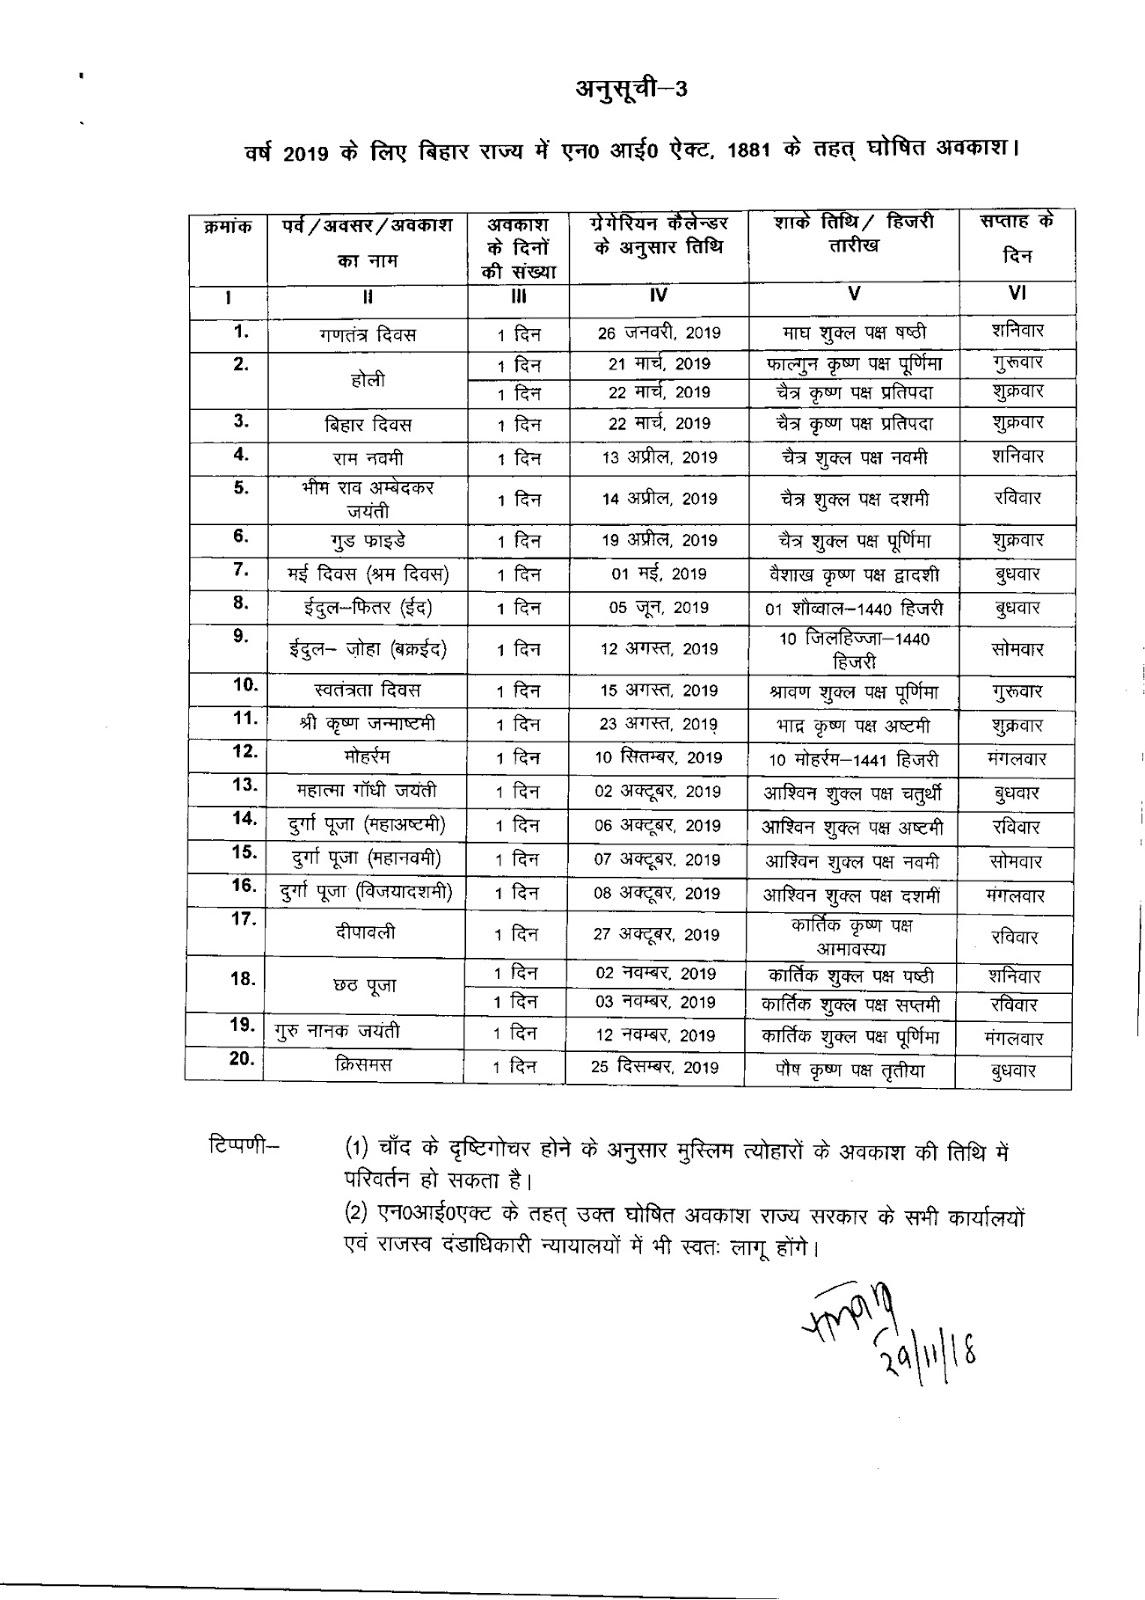 Bihar Government Calendar 2019 #educratsweb intended for Bihar Goverment Calender 2020